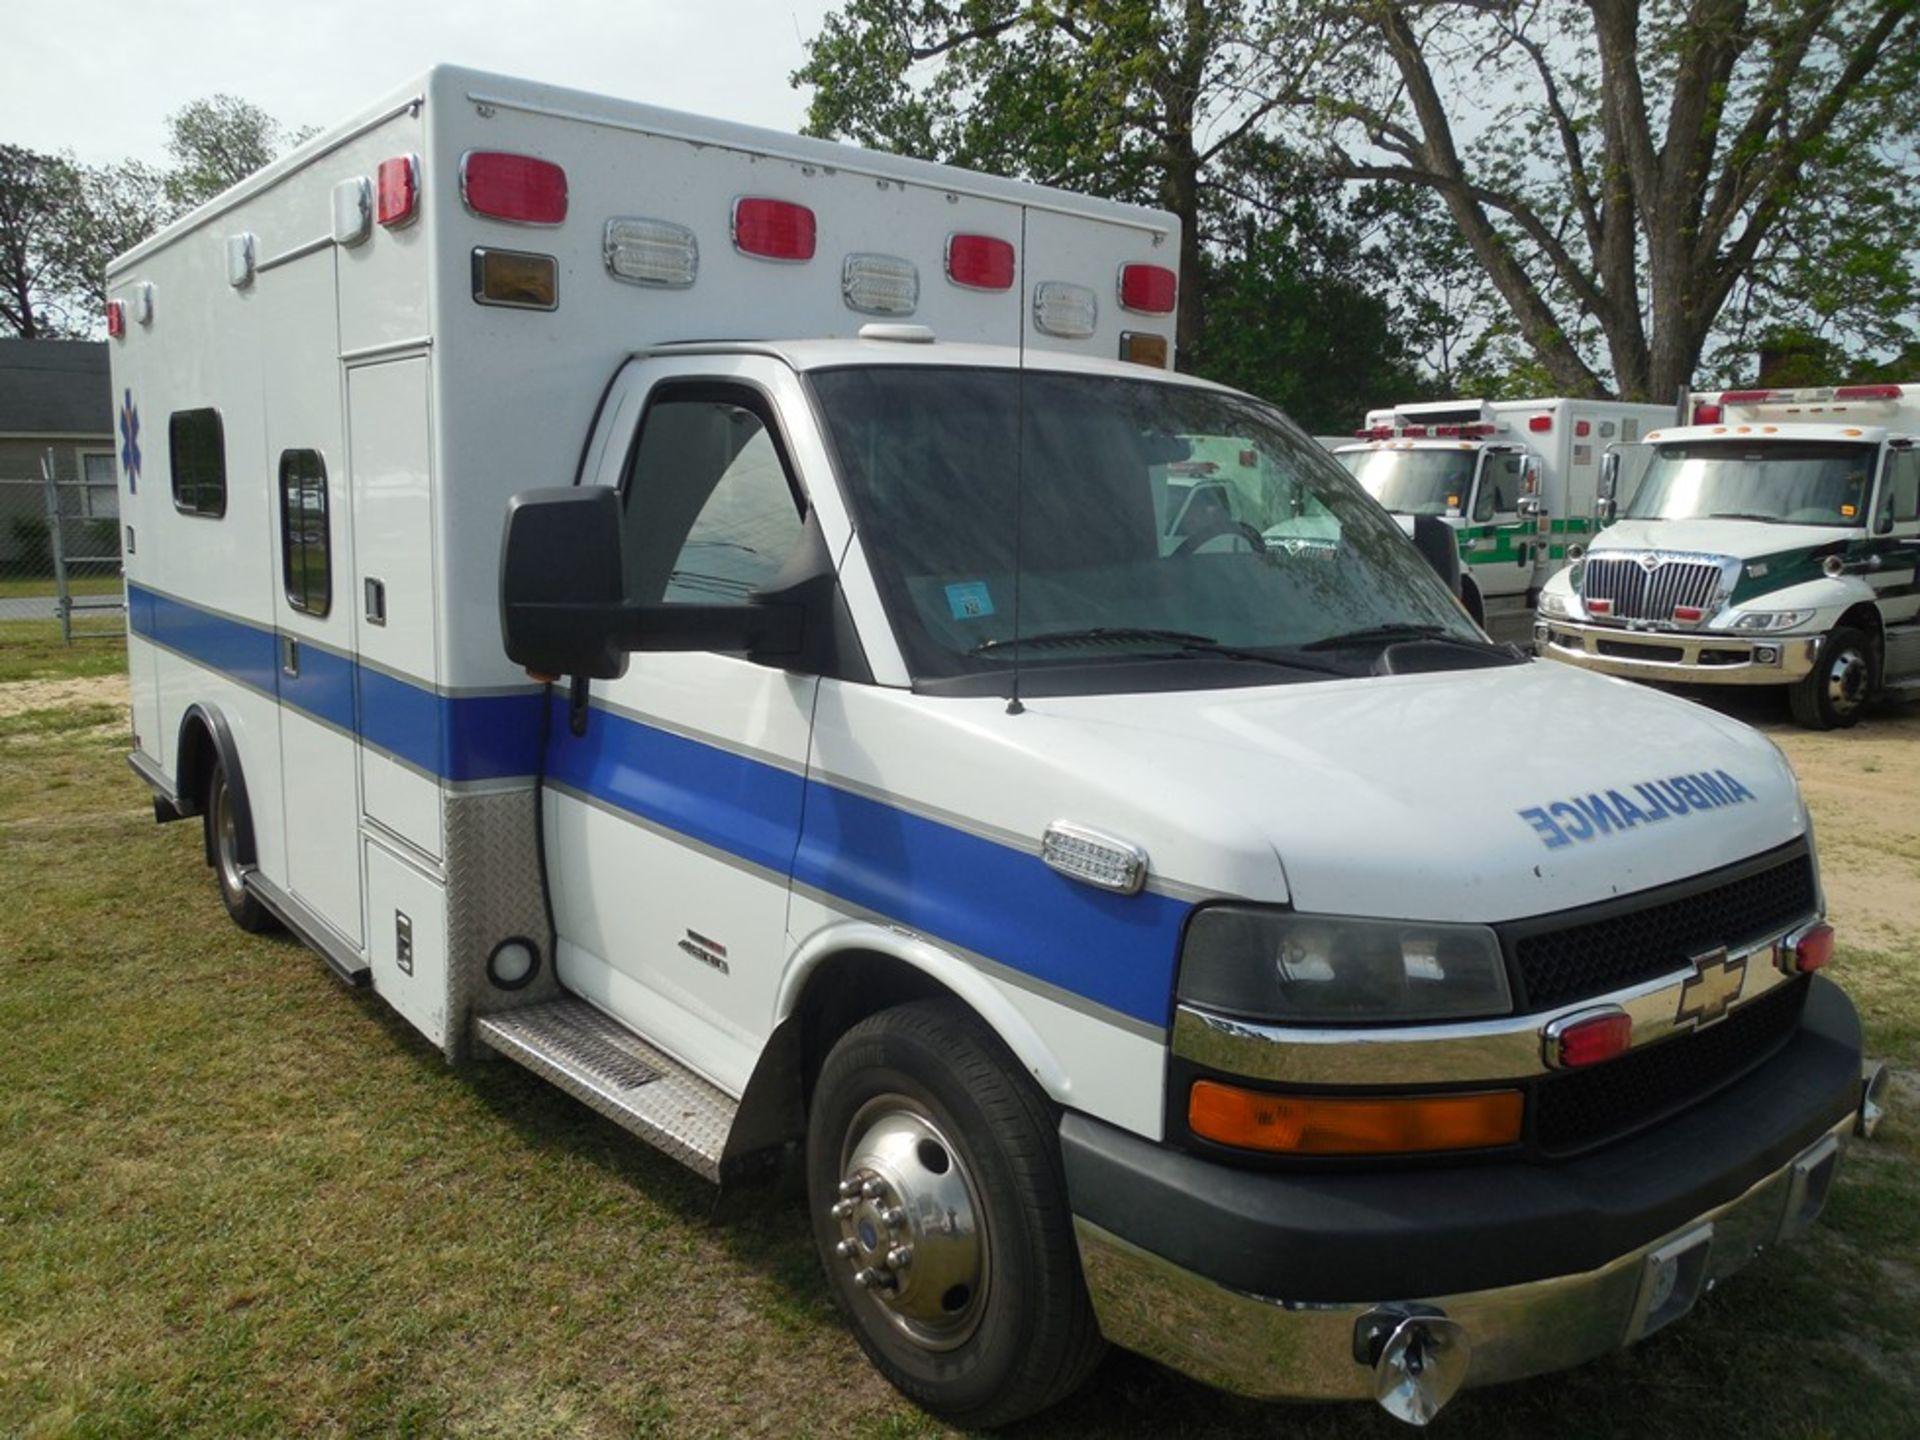 2010 Chev 4500 dsl box ambulance 258,589 miles, vin# 1GB9G5B6XA1132748 - Image 3 of 6